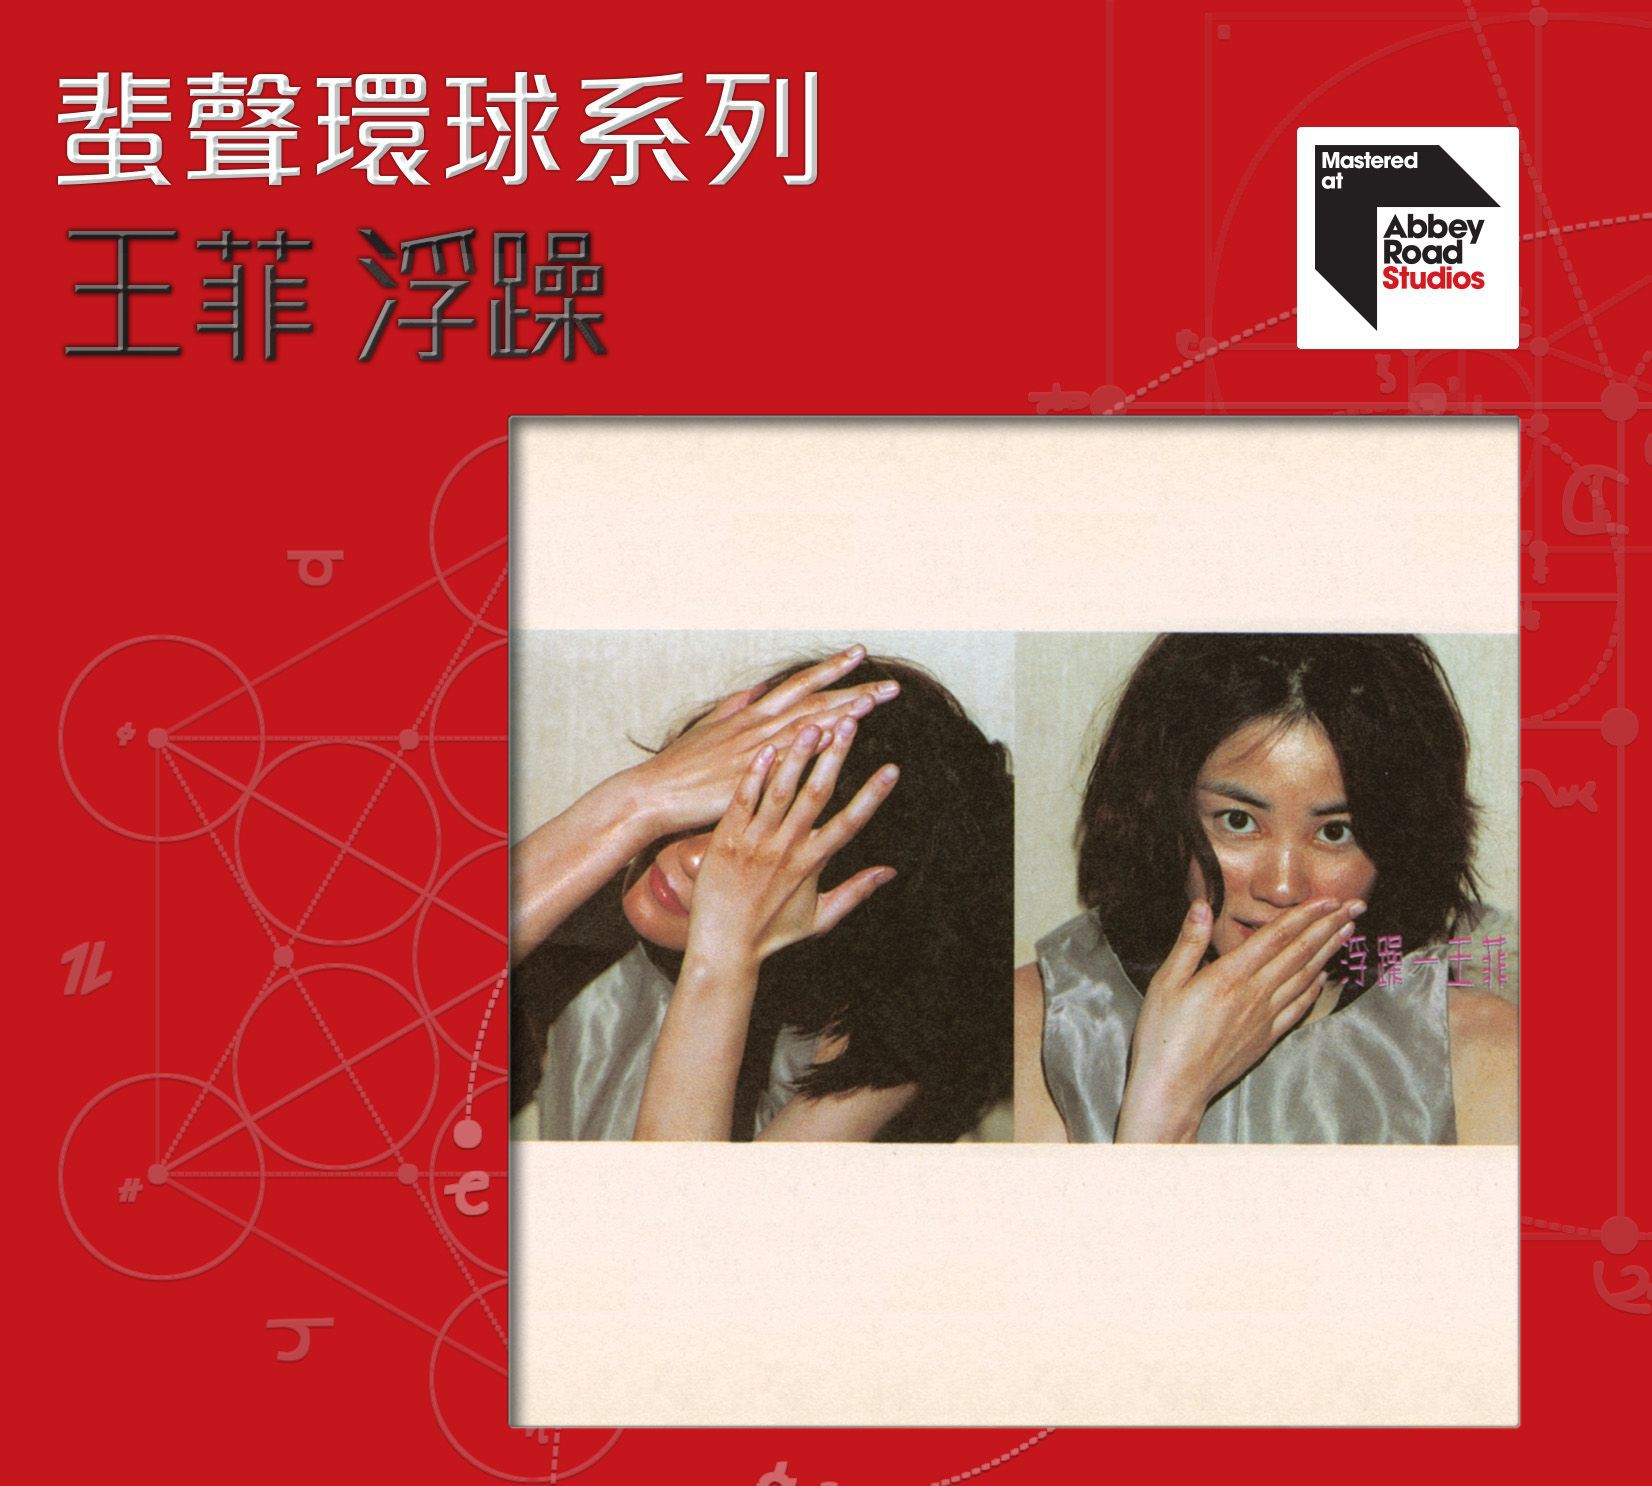 王菲 (Faye Wong) – 浮躁 (蜚聲環球系列) [FLAC / Lossless / CD] [1996.06.03]